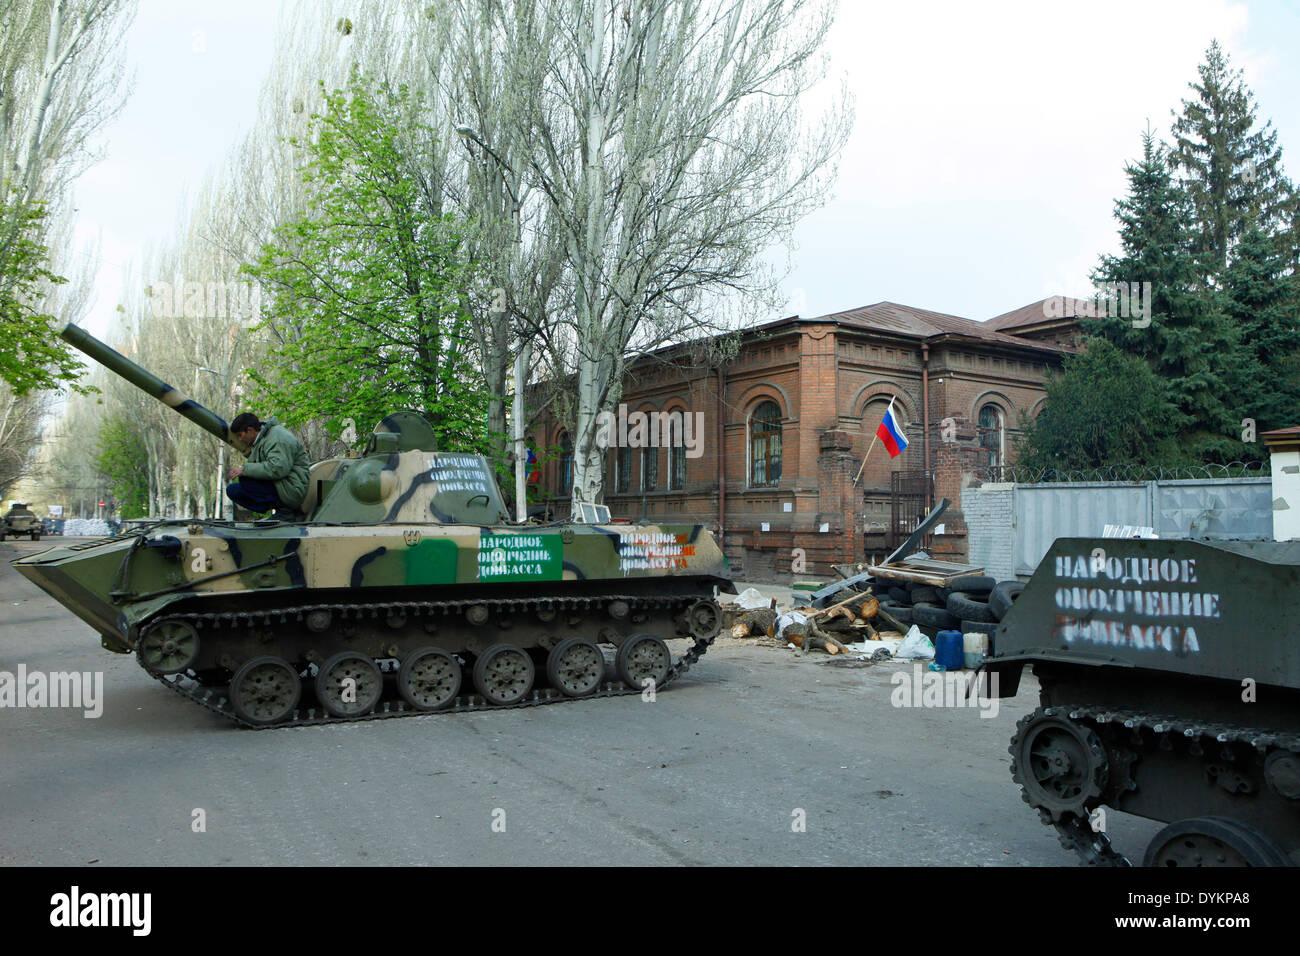 Sloviansk, Ukraine. 21st Apr, 2014. In photo: tanks on the barricade to protect the occupied ukrainian spy office. Stock Photo